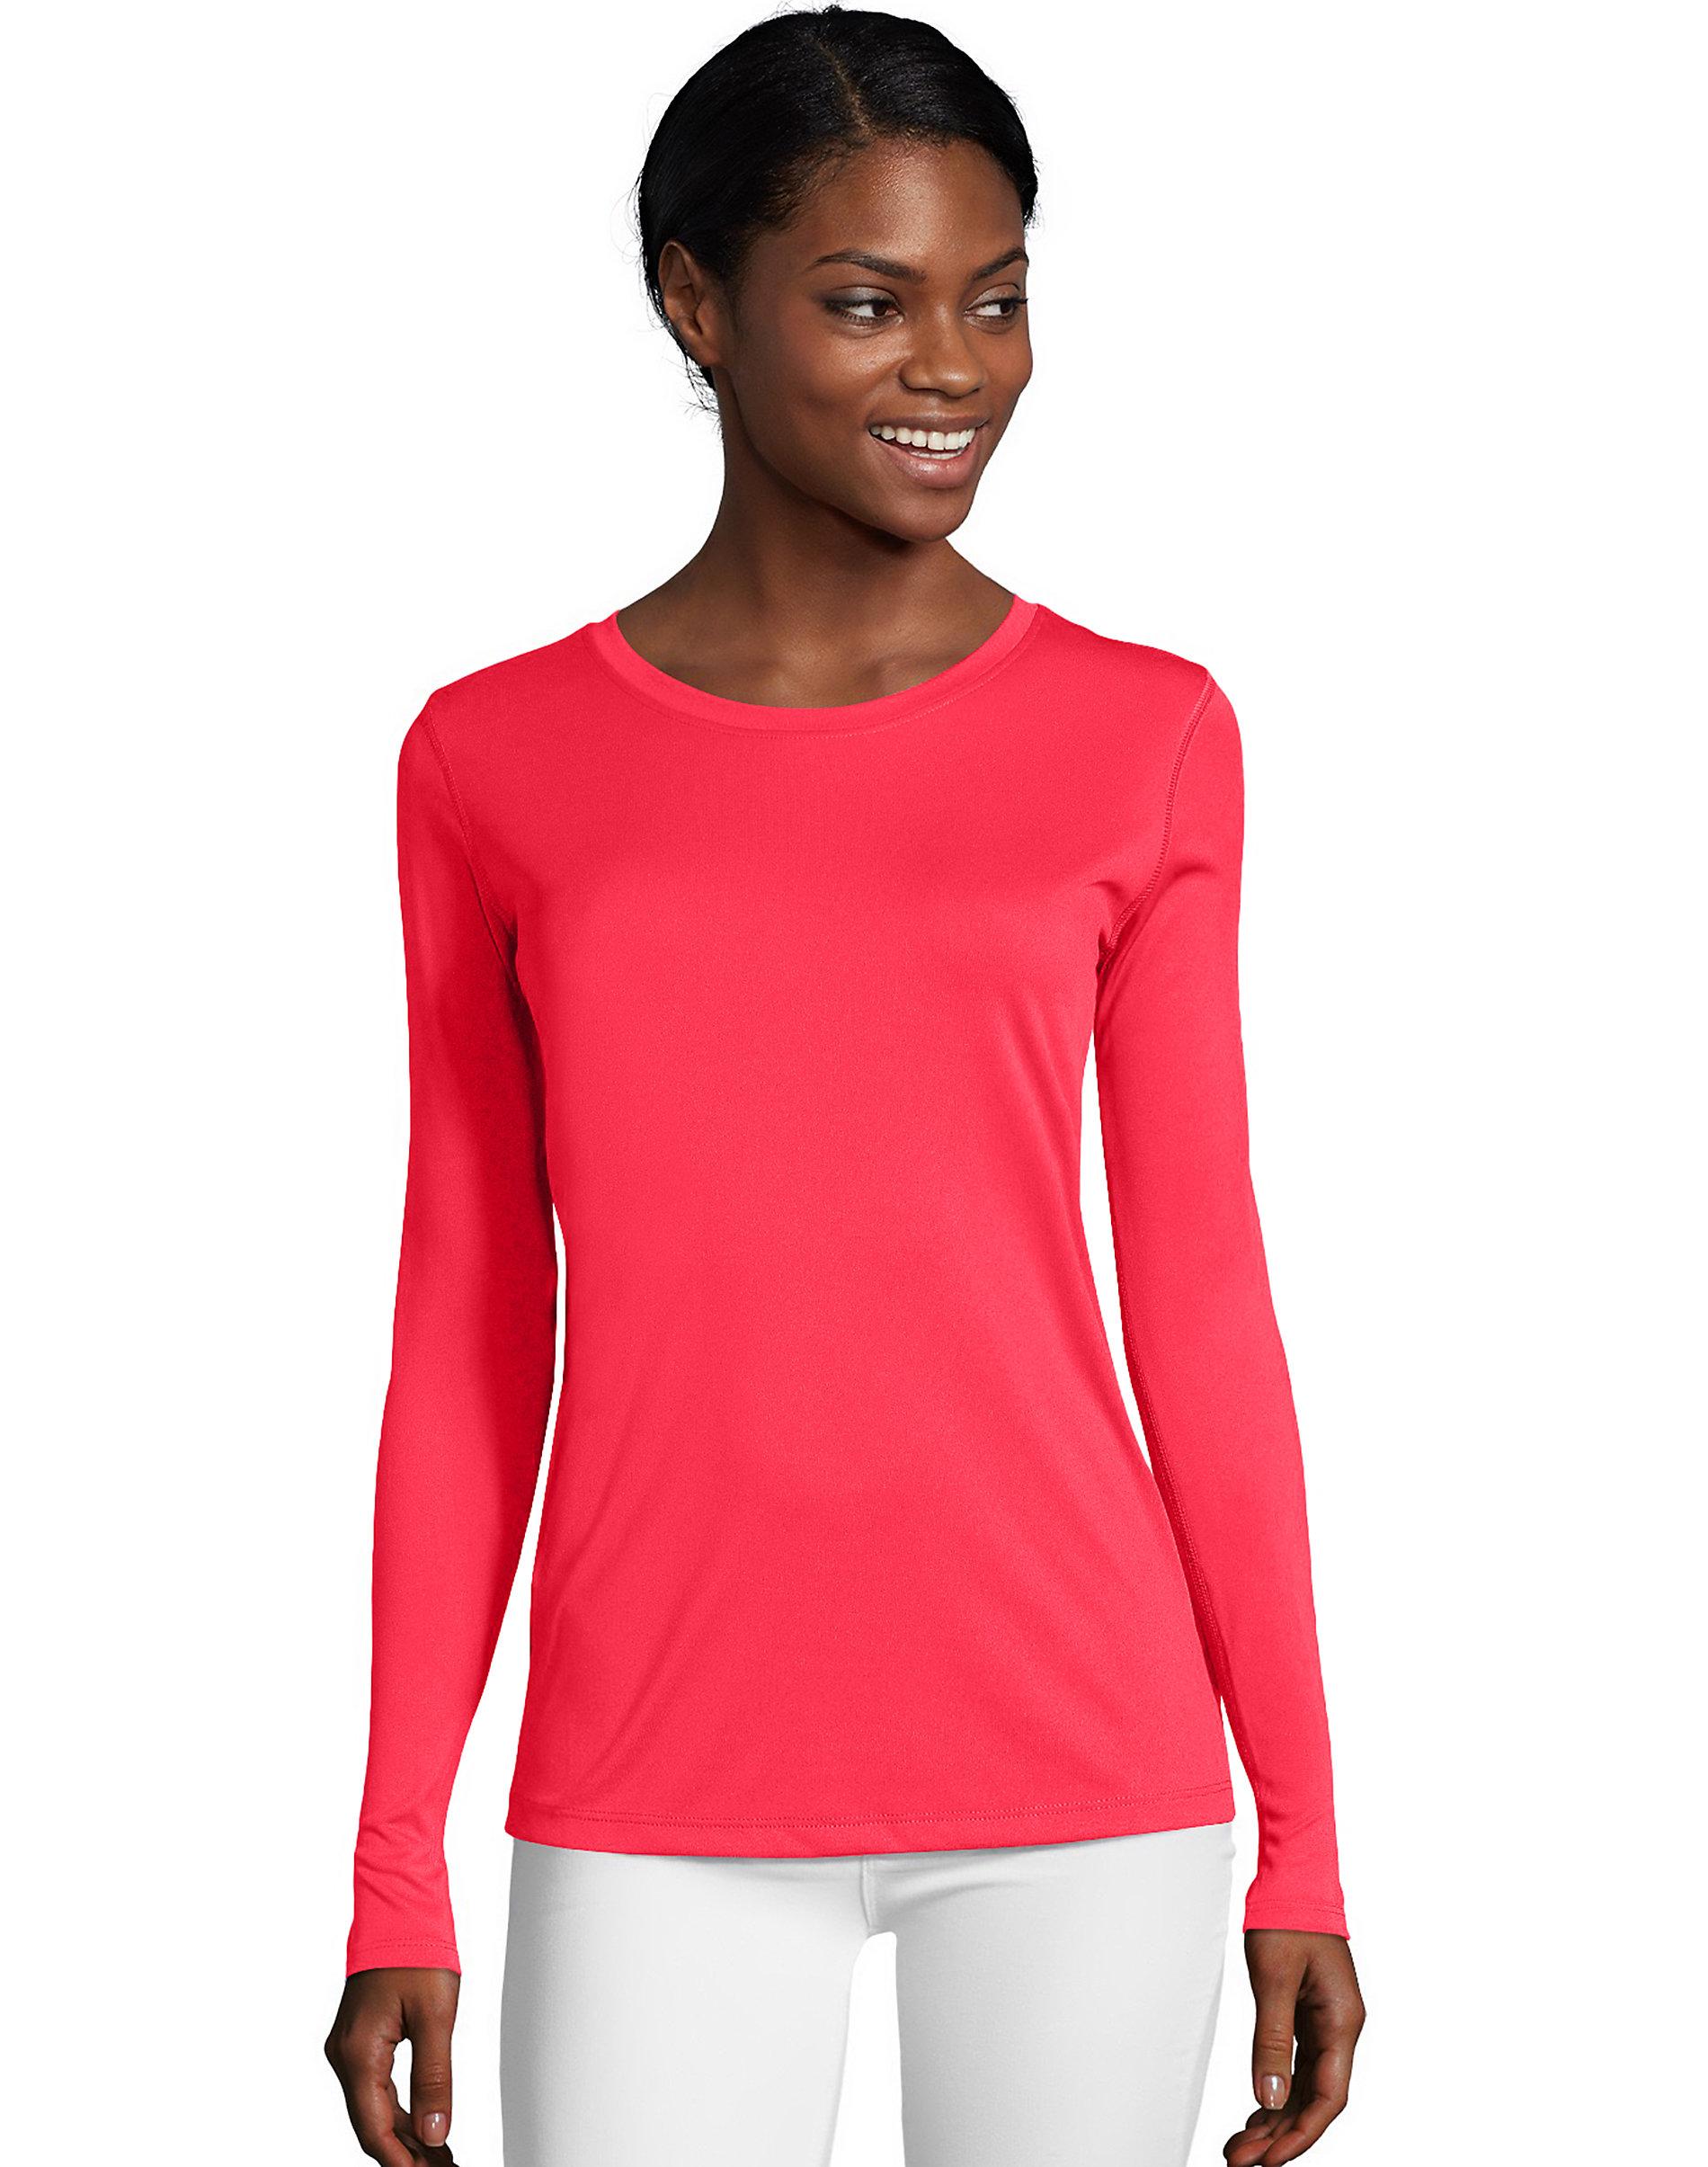 Hanes-Long-Sleeve-T-Shirt-Sport-Cool-DRI-Womens-Performance-Tee-Activewear-S-2XL thumbnail 6